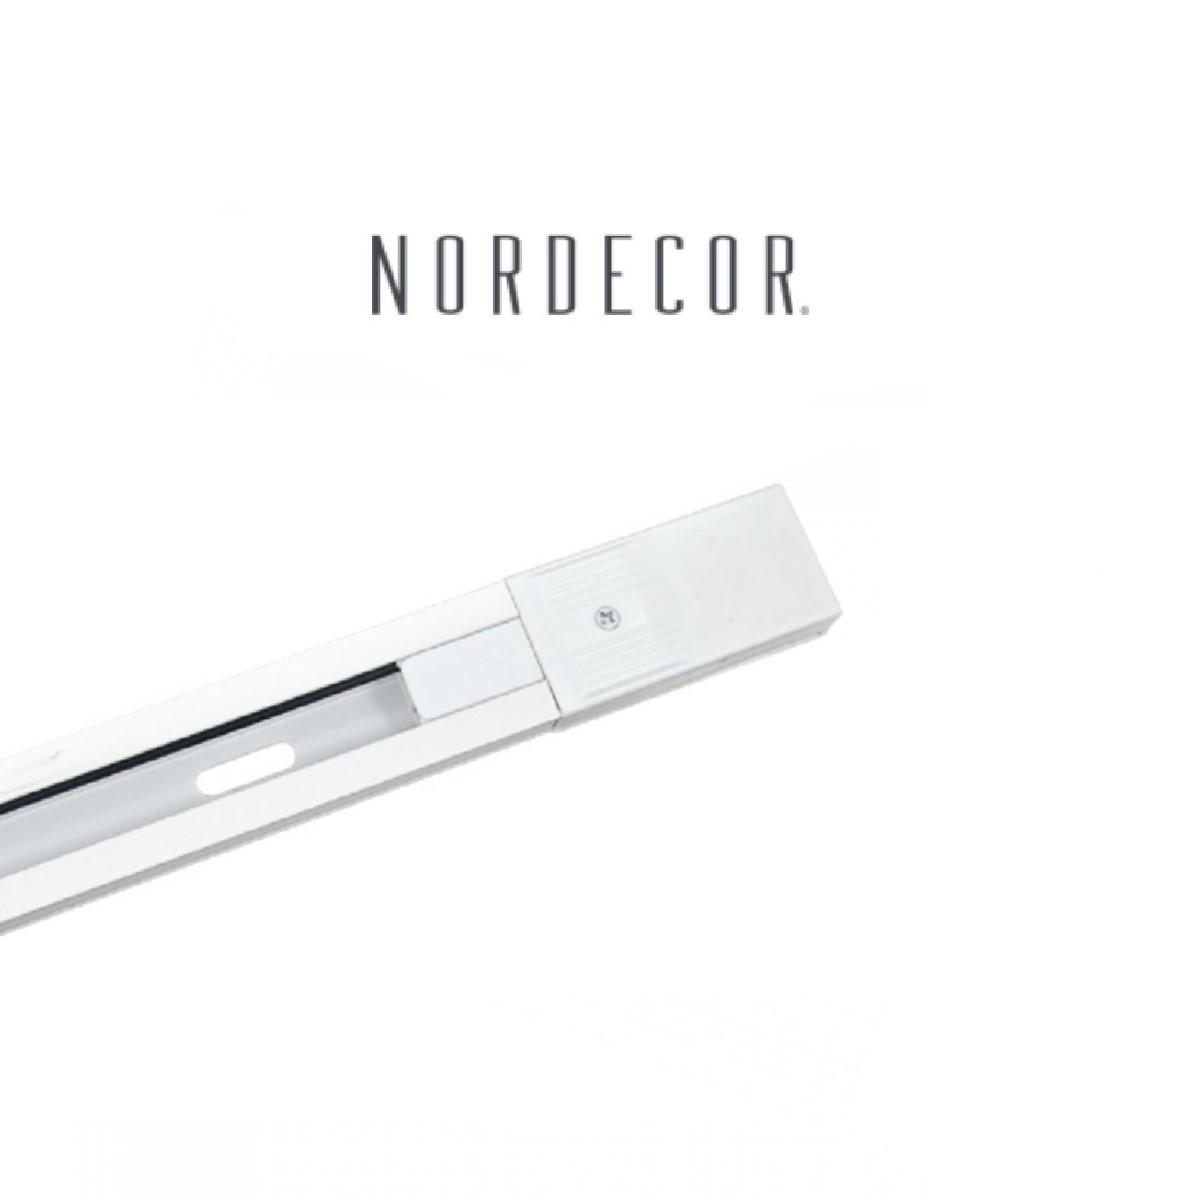 Trilho Eletrificado 1,5m Branco Para Spots Eletrificado Nordecor 6254